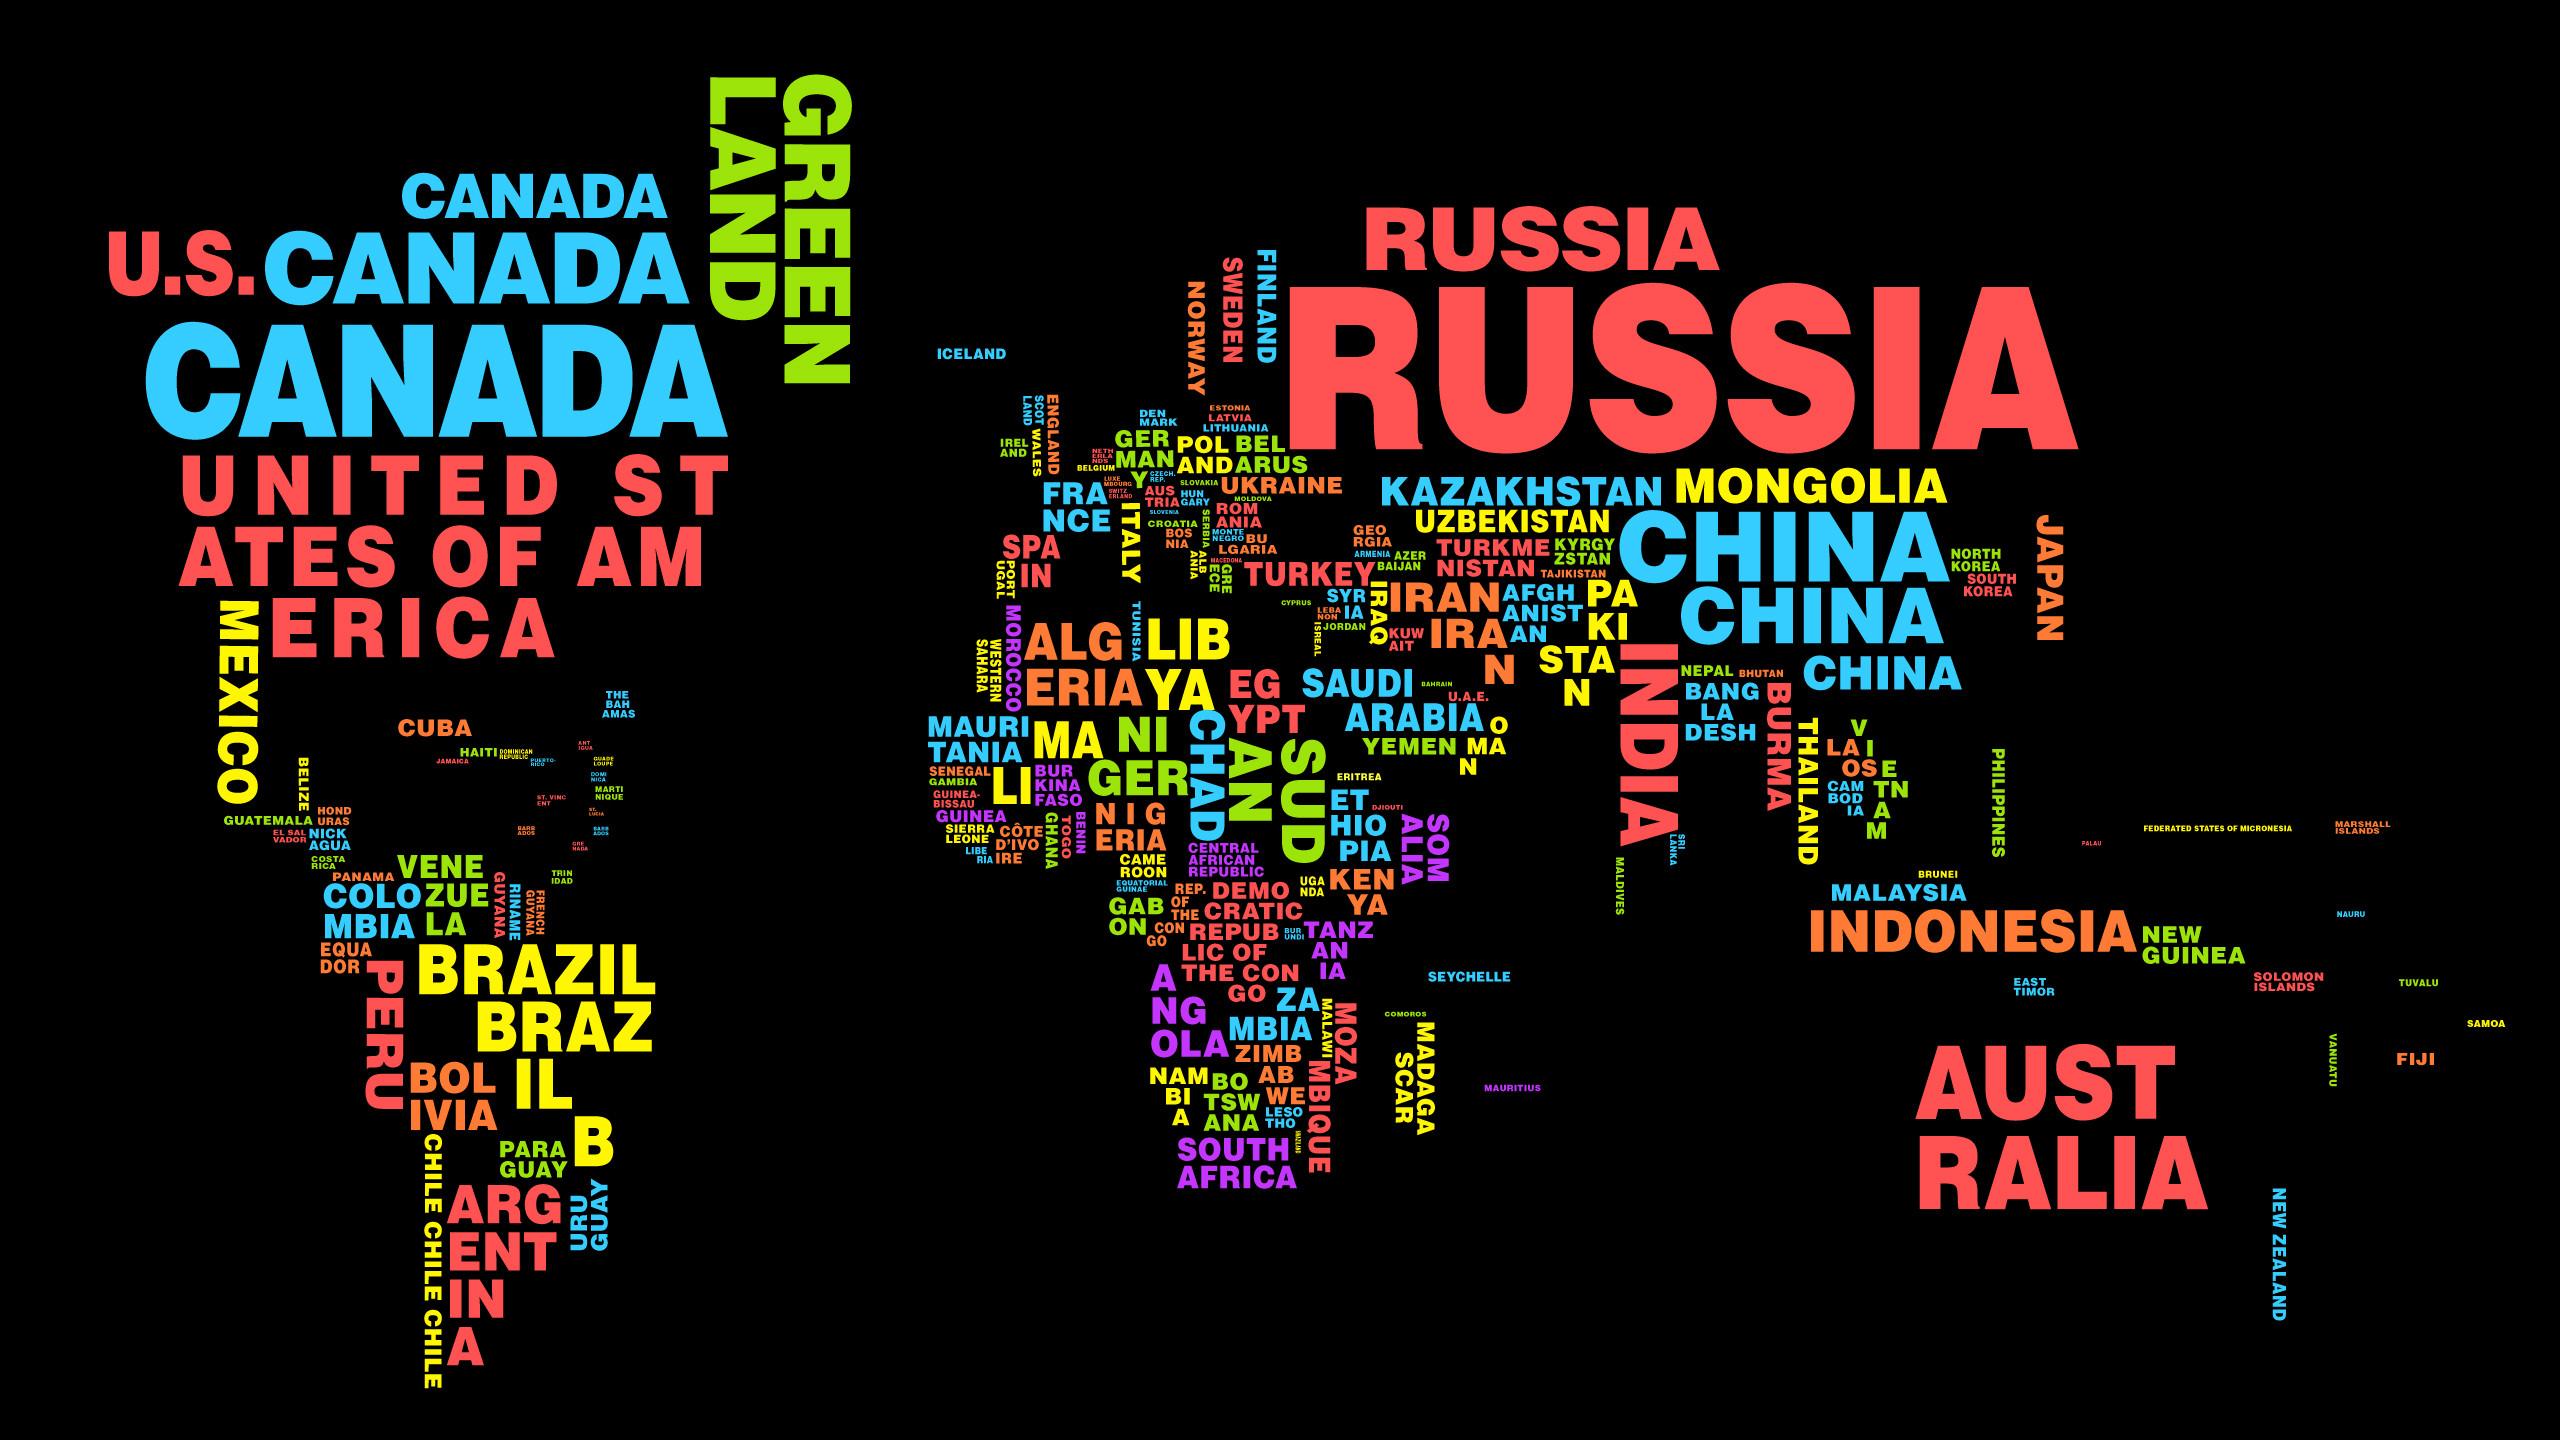 World Map Desktop Wallpaper (54+ images) on techno wallpaper, 3840x1080 wallpaper, super high resolution wallpaper, 2k wallpaper, 12k wallpaper, 2560x1440 wallpaper, gaming mashup wallpaper, 7680x4320 wallpaper, 720p wallpaper, 5760x1080 wallpaper, 2880 x 1800 wallpaper, 2560x1600 wallpaper, mkbhd wallpaper, uhd wallpaper, 3840 x 2160 wallpaper, 3840x2160 wallpaper, 8k wallpaper,